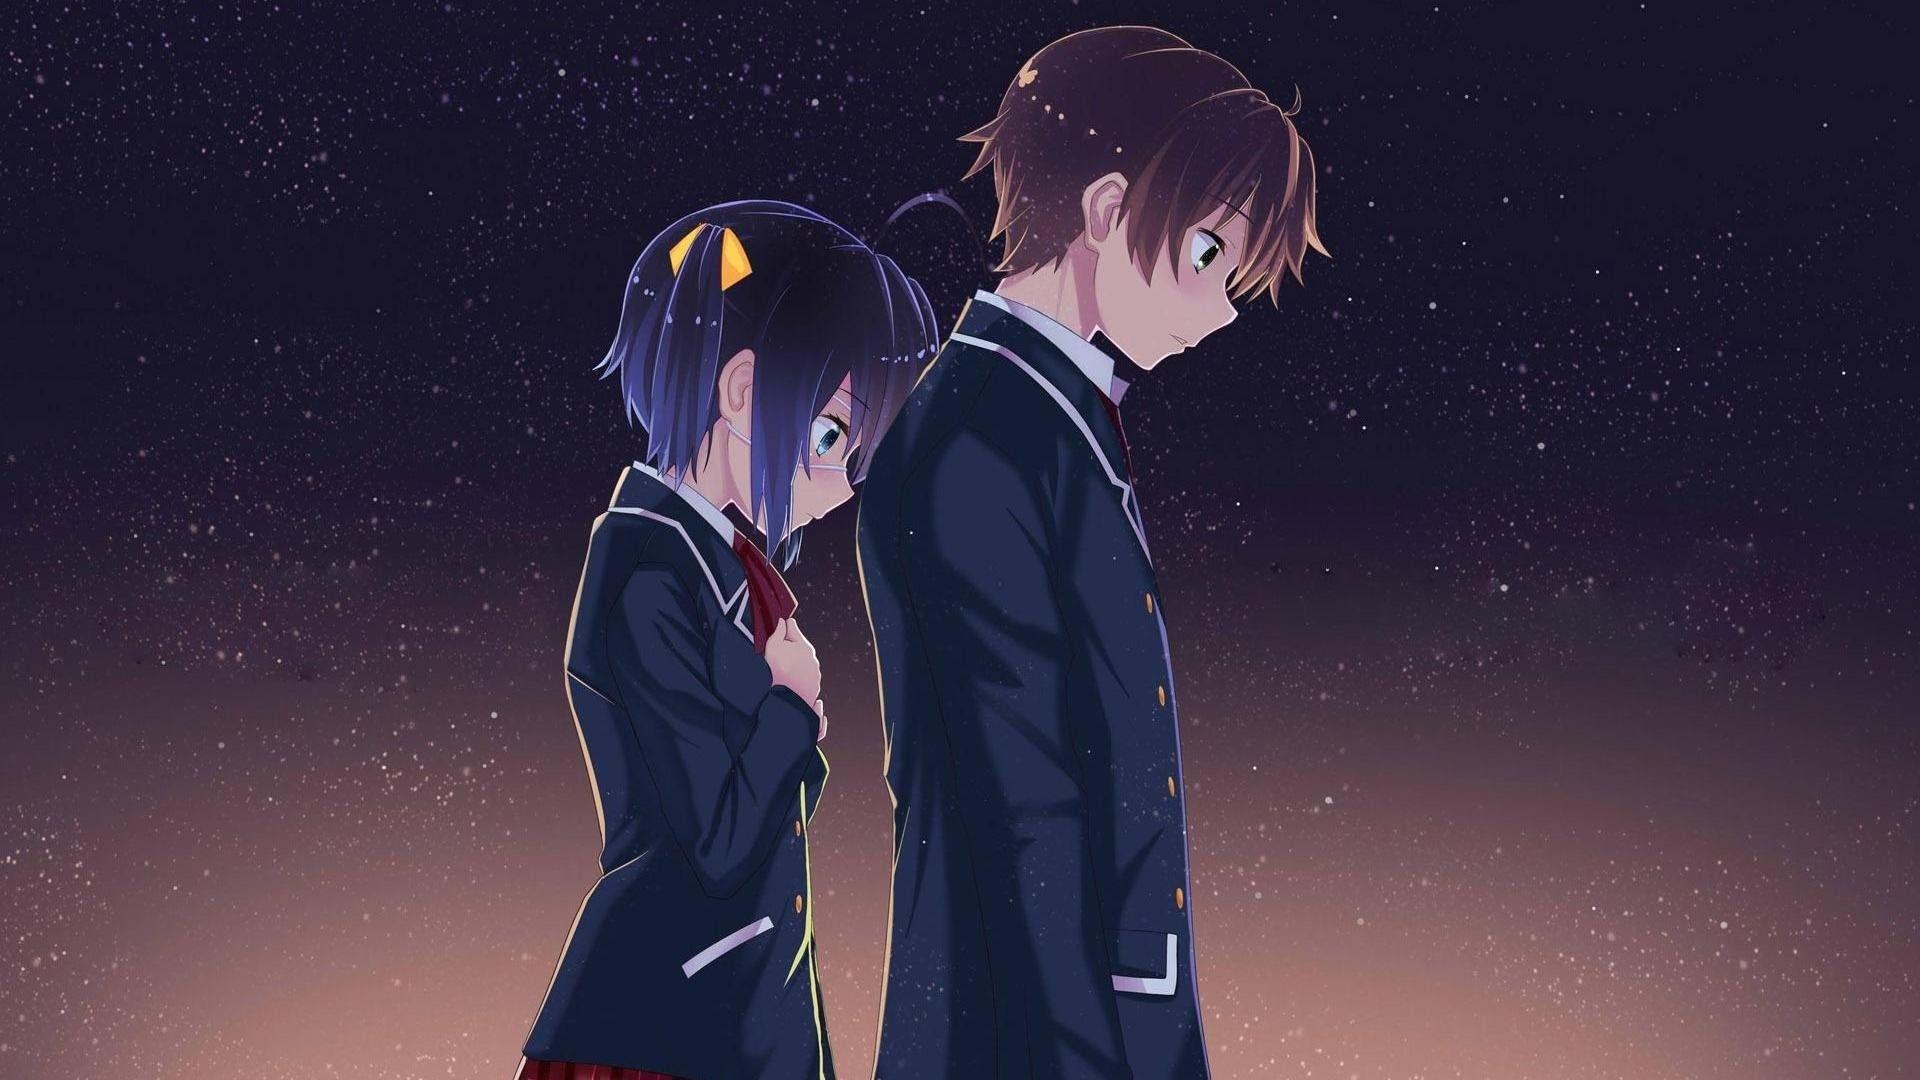 Love Chunibyo And Other Delusions Desktop Nexus Wallpaper 1920x1080 Anime Koi Nightcore